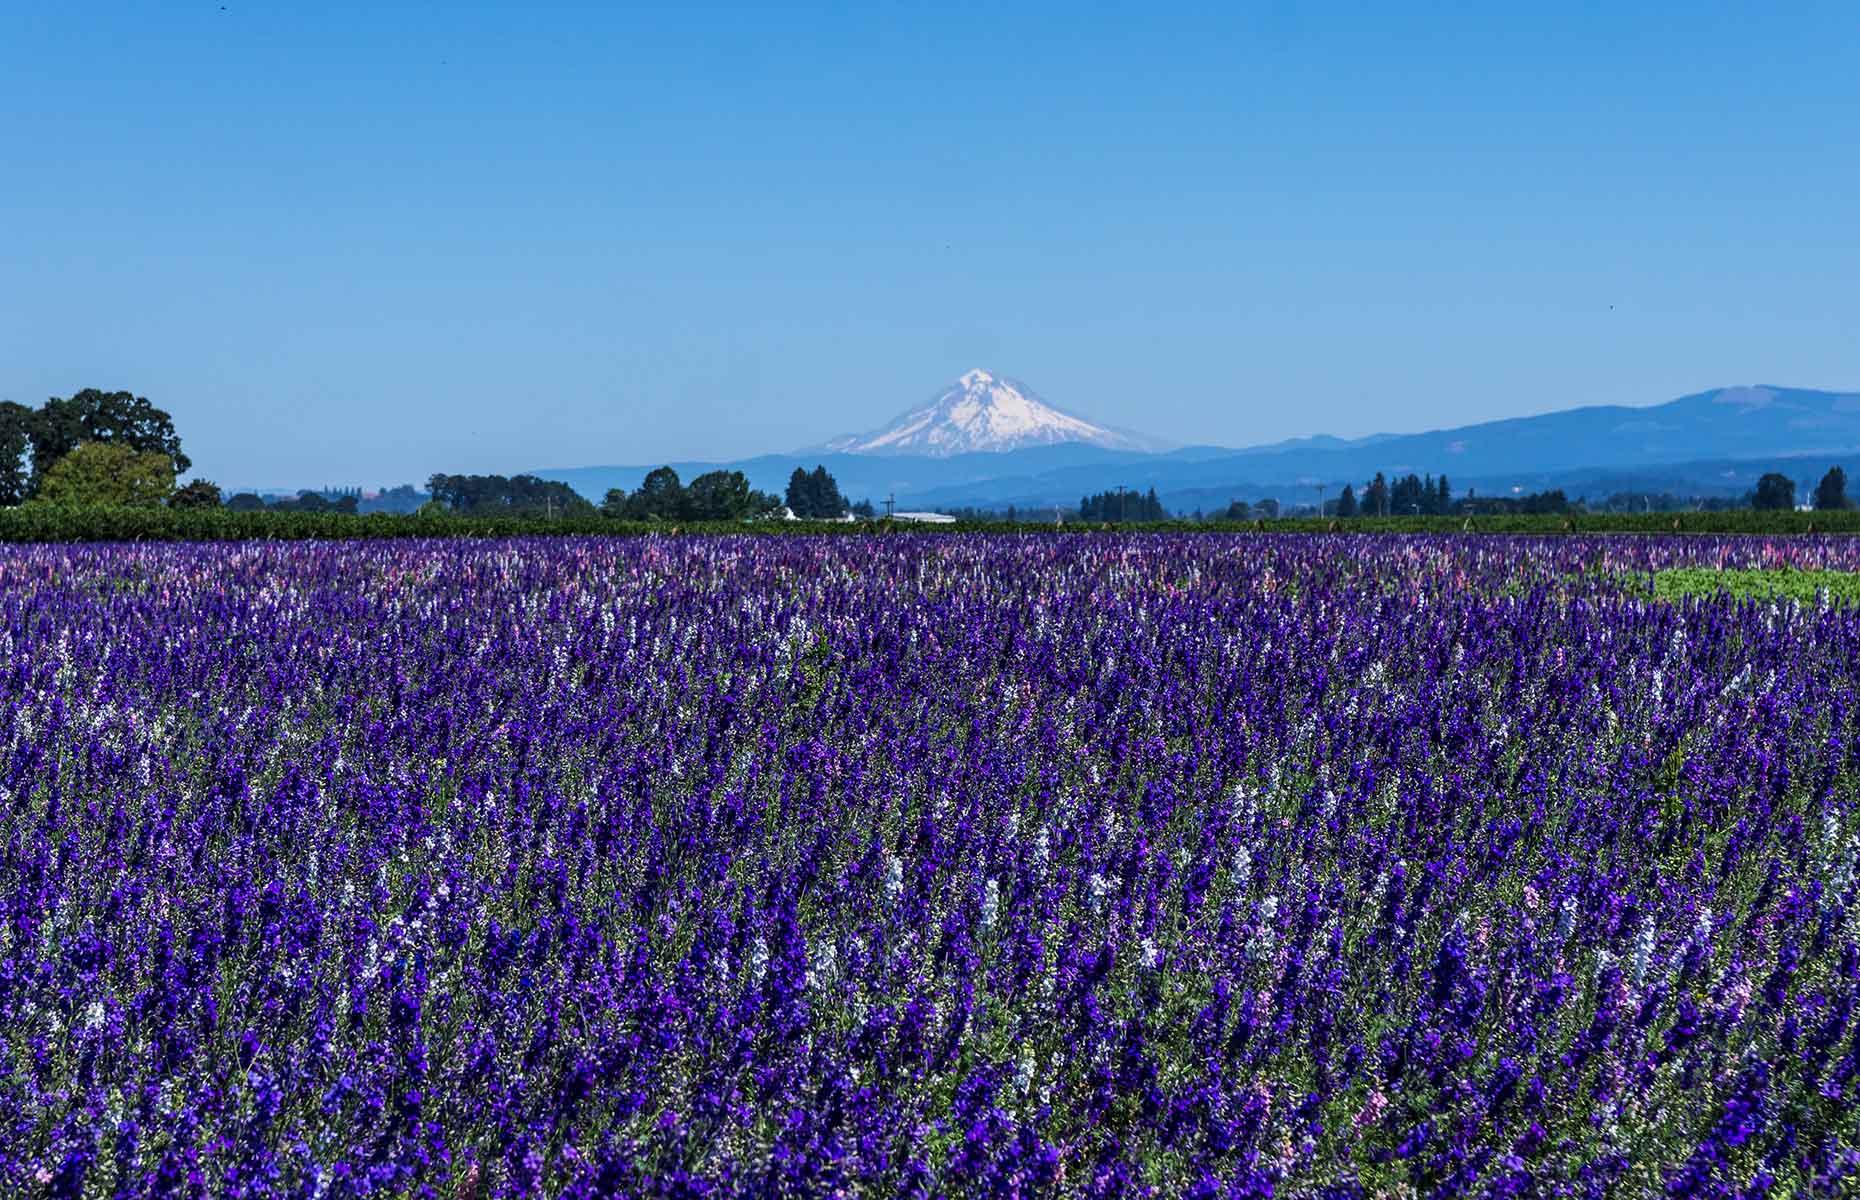 Lavender fields Willamette Valley, Oregon (Image: Cynthia Liang/Shutterstock)